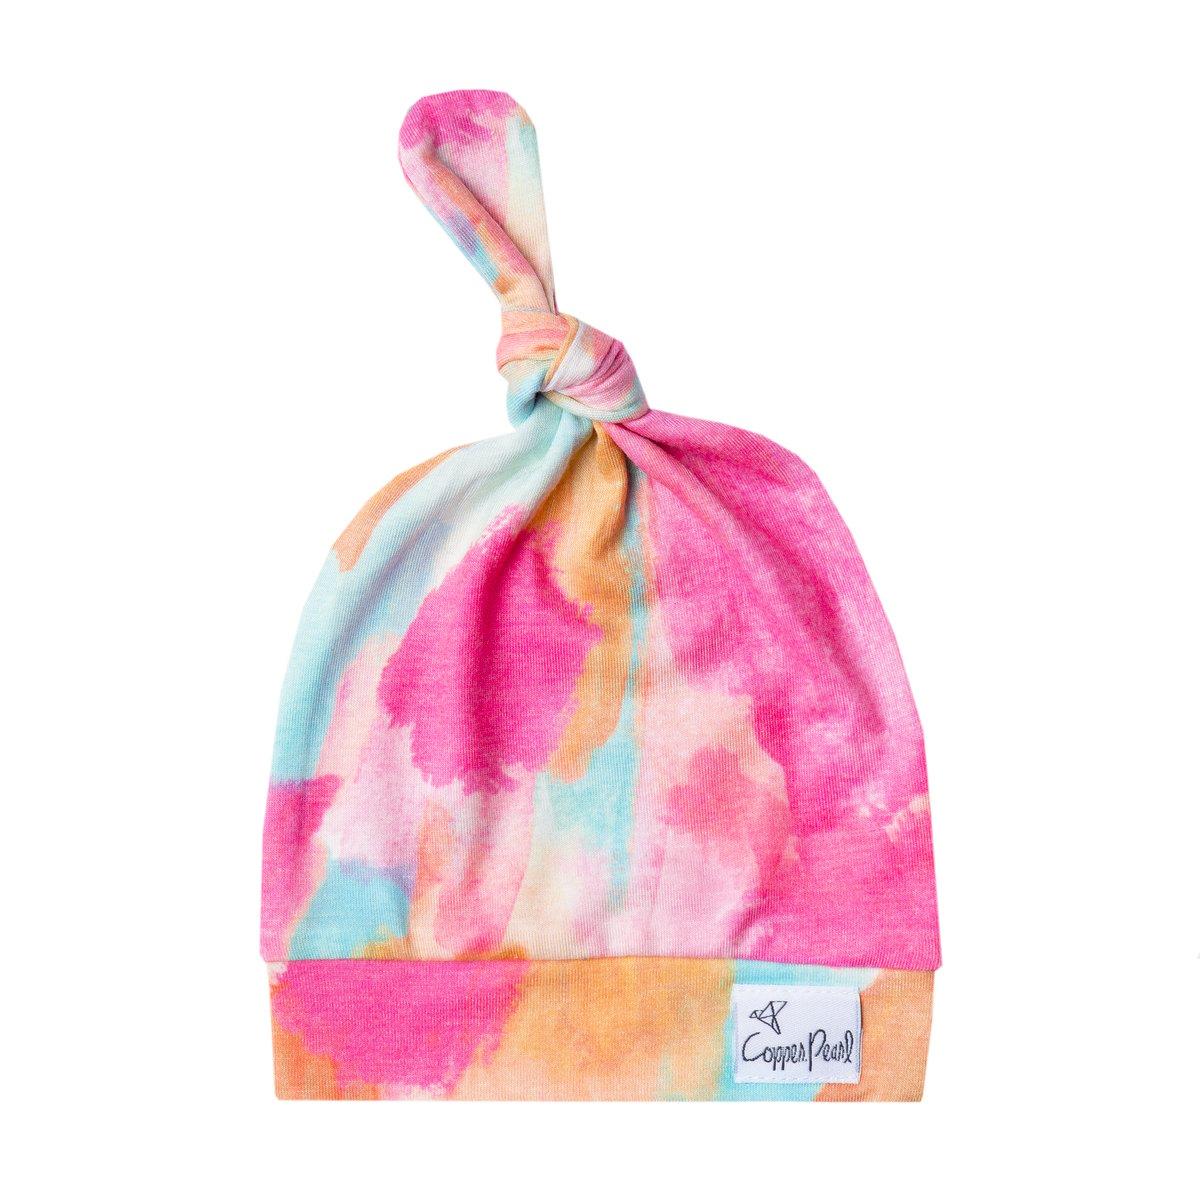 Image of Newborn Top Knot Hat- Monet